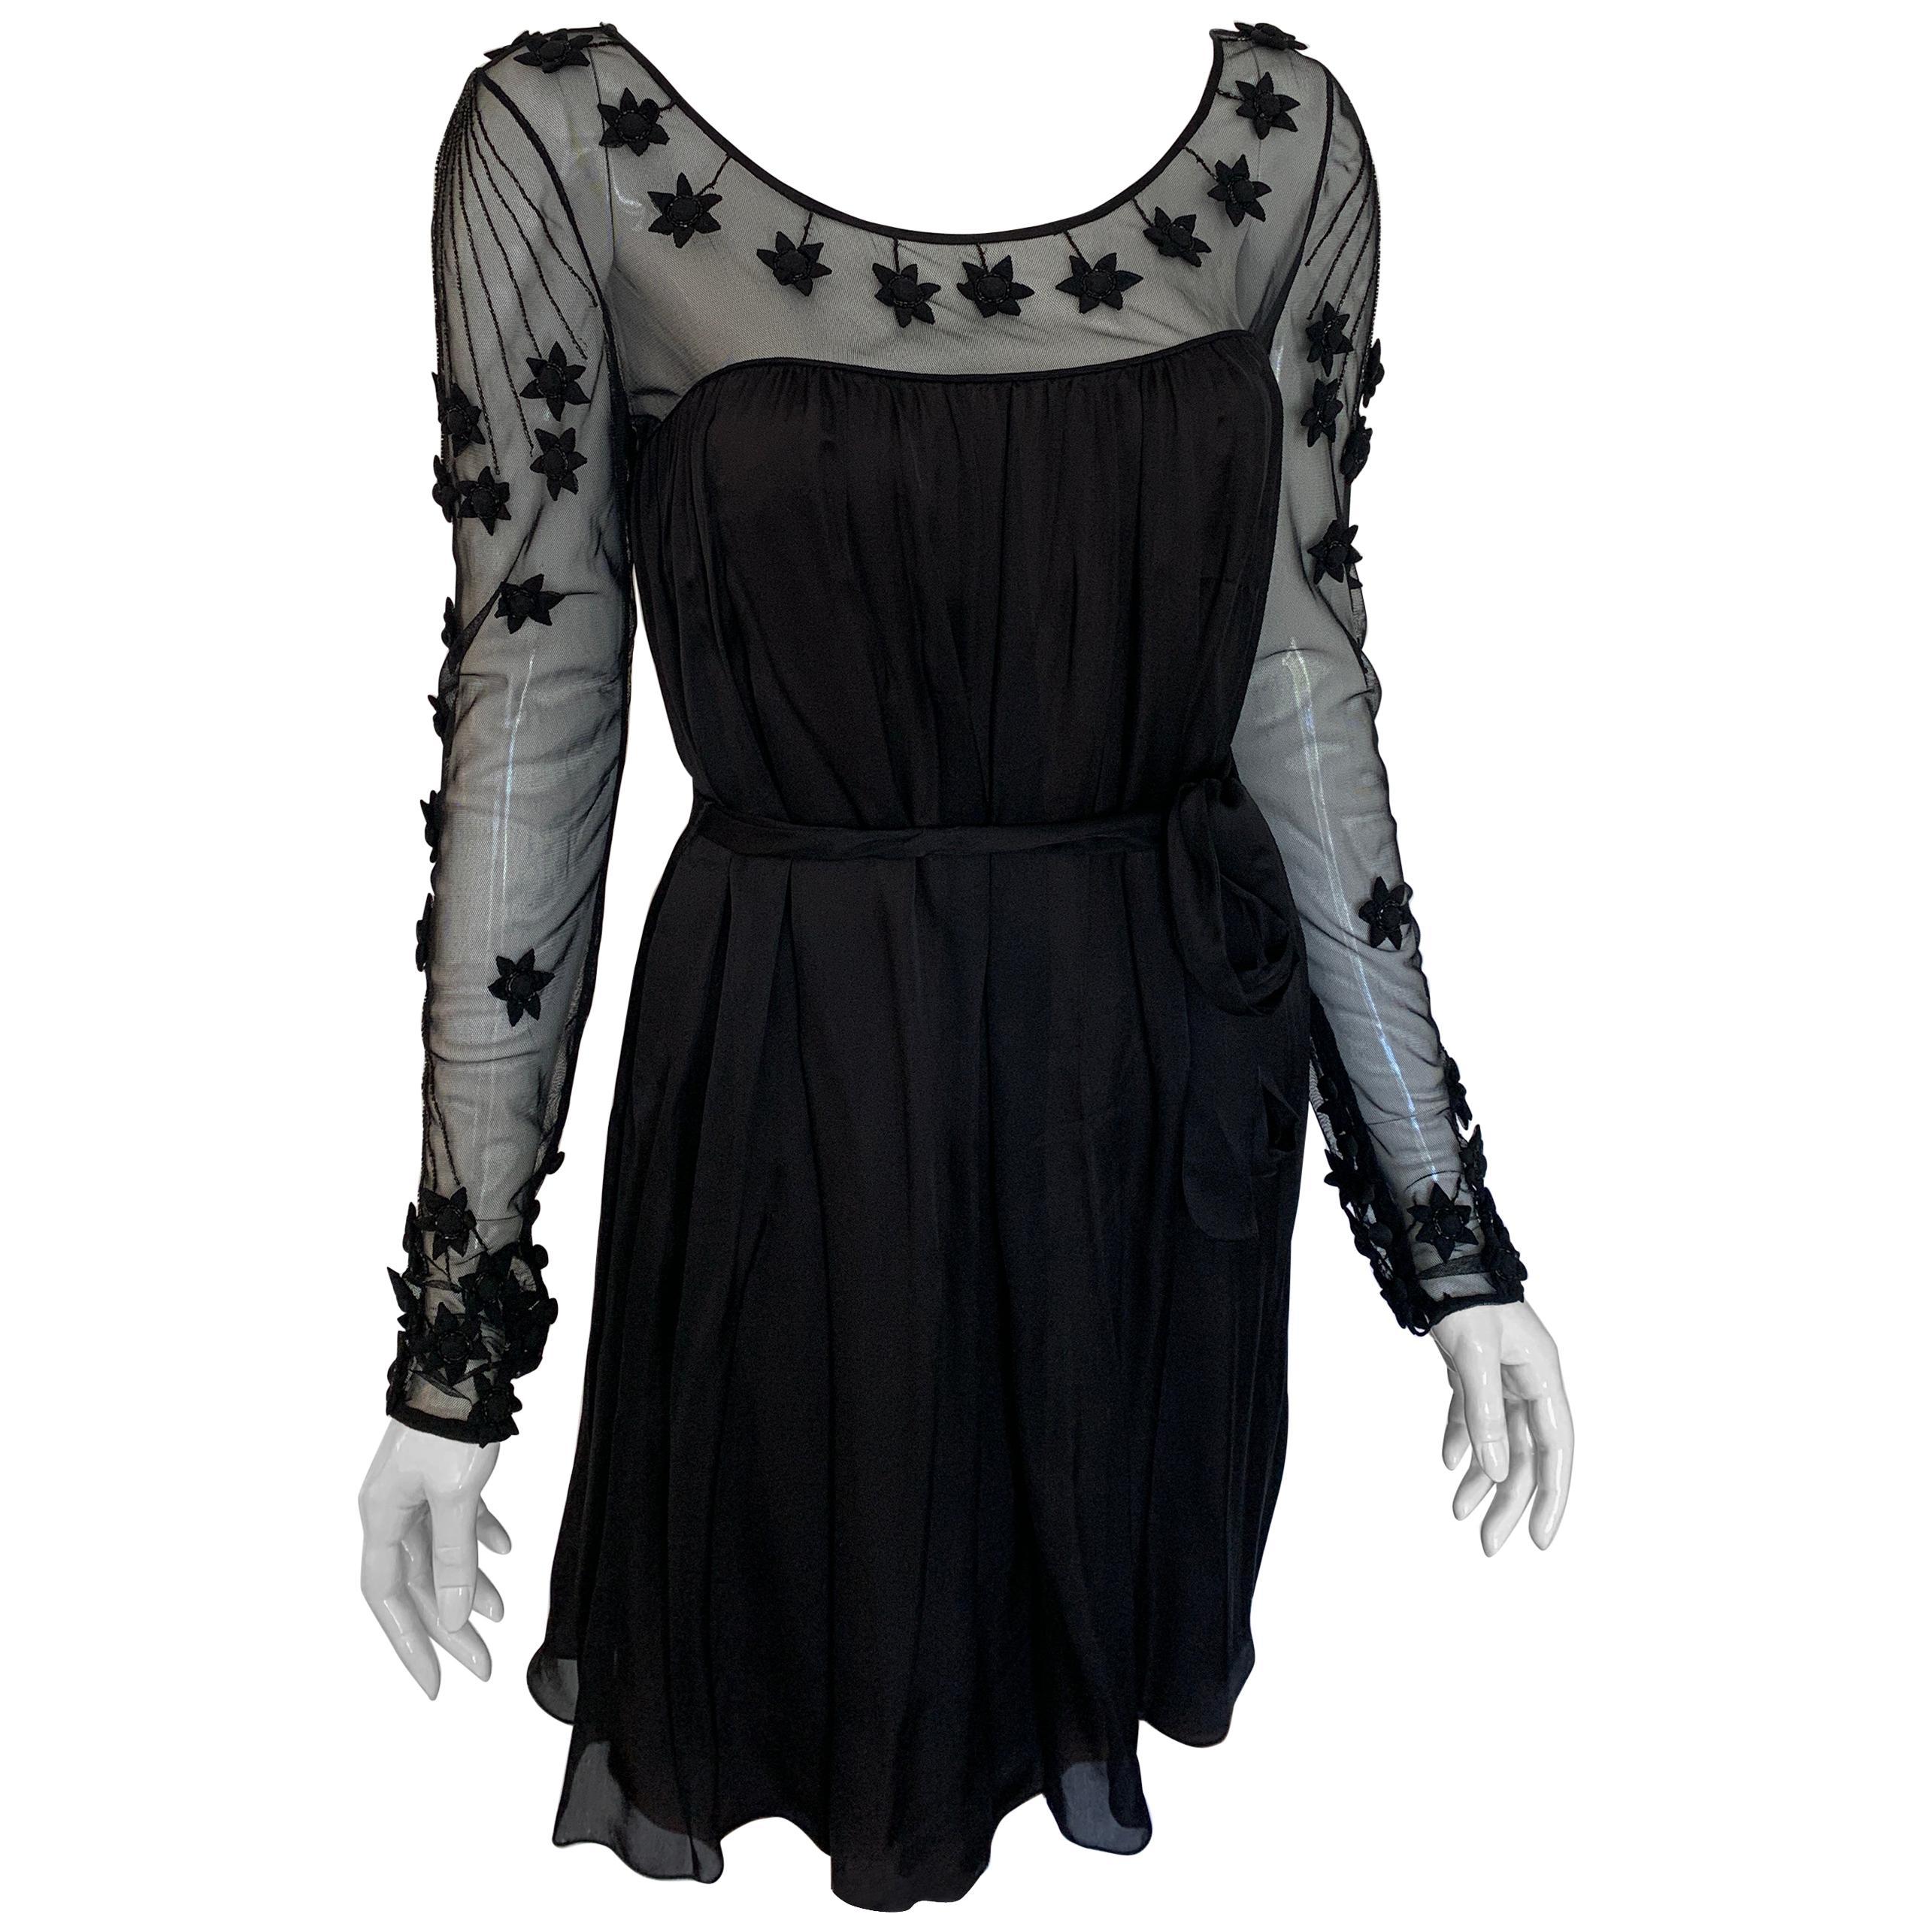 Temperley Black Flower Applique Silk Dress Small